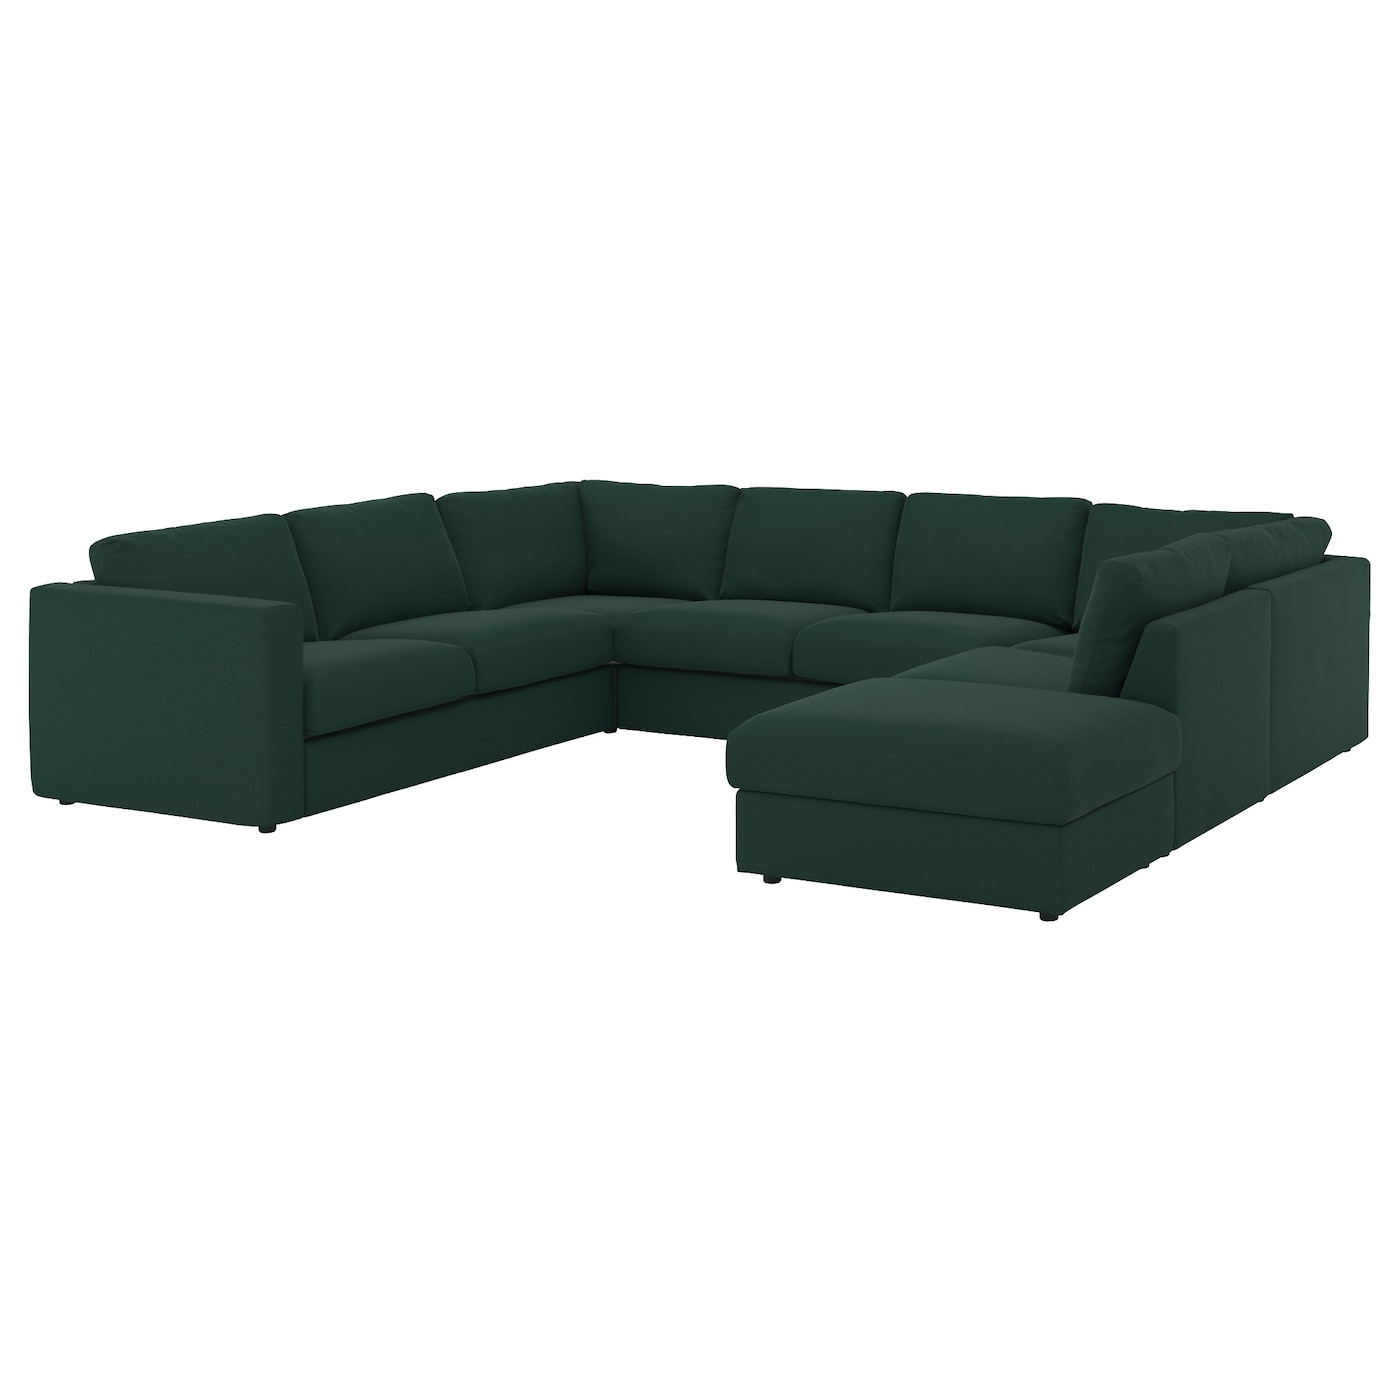 Ikea Vimle U Shaped Sofa 6 Seat 10 Year Guarantee Read About The